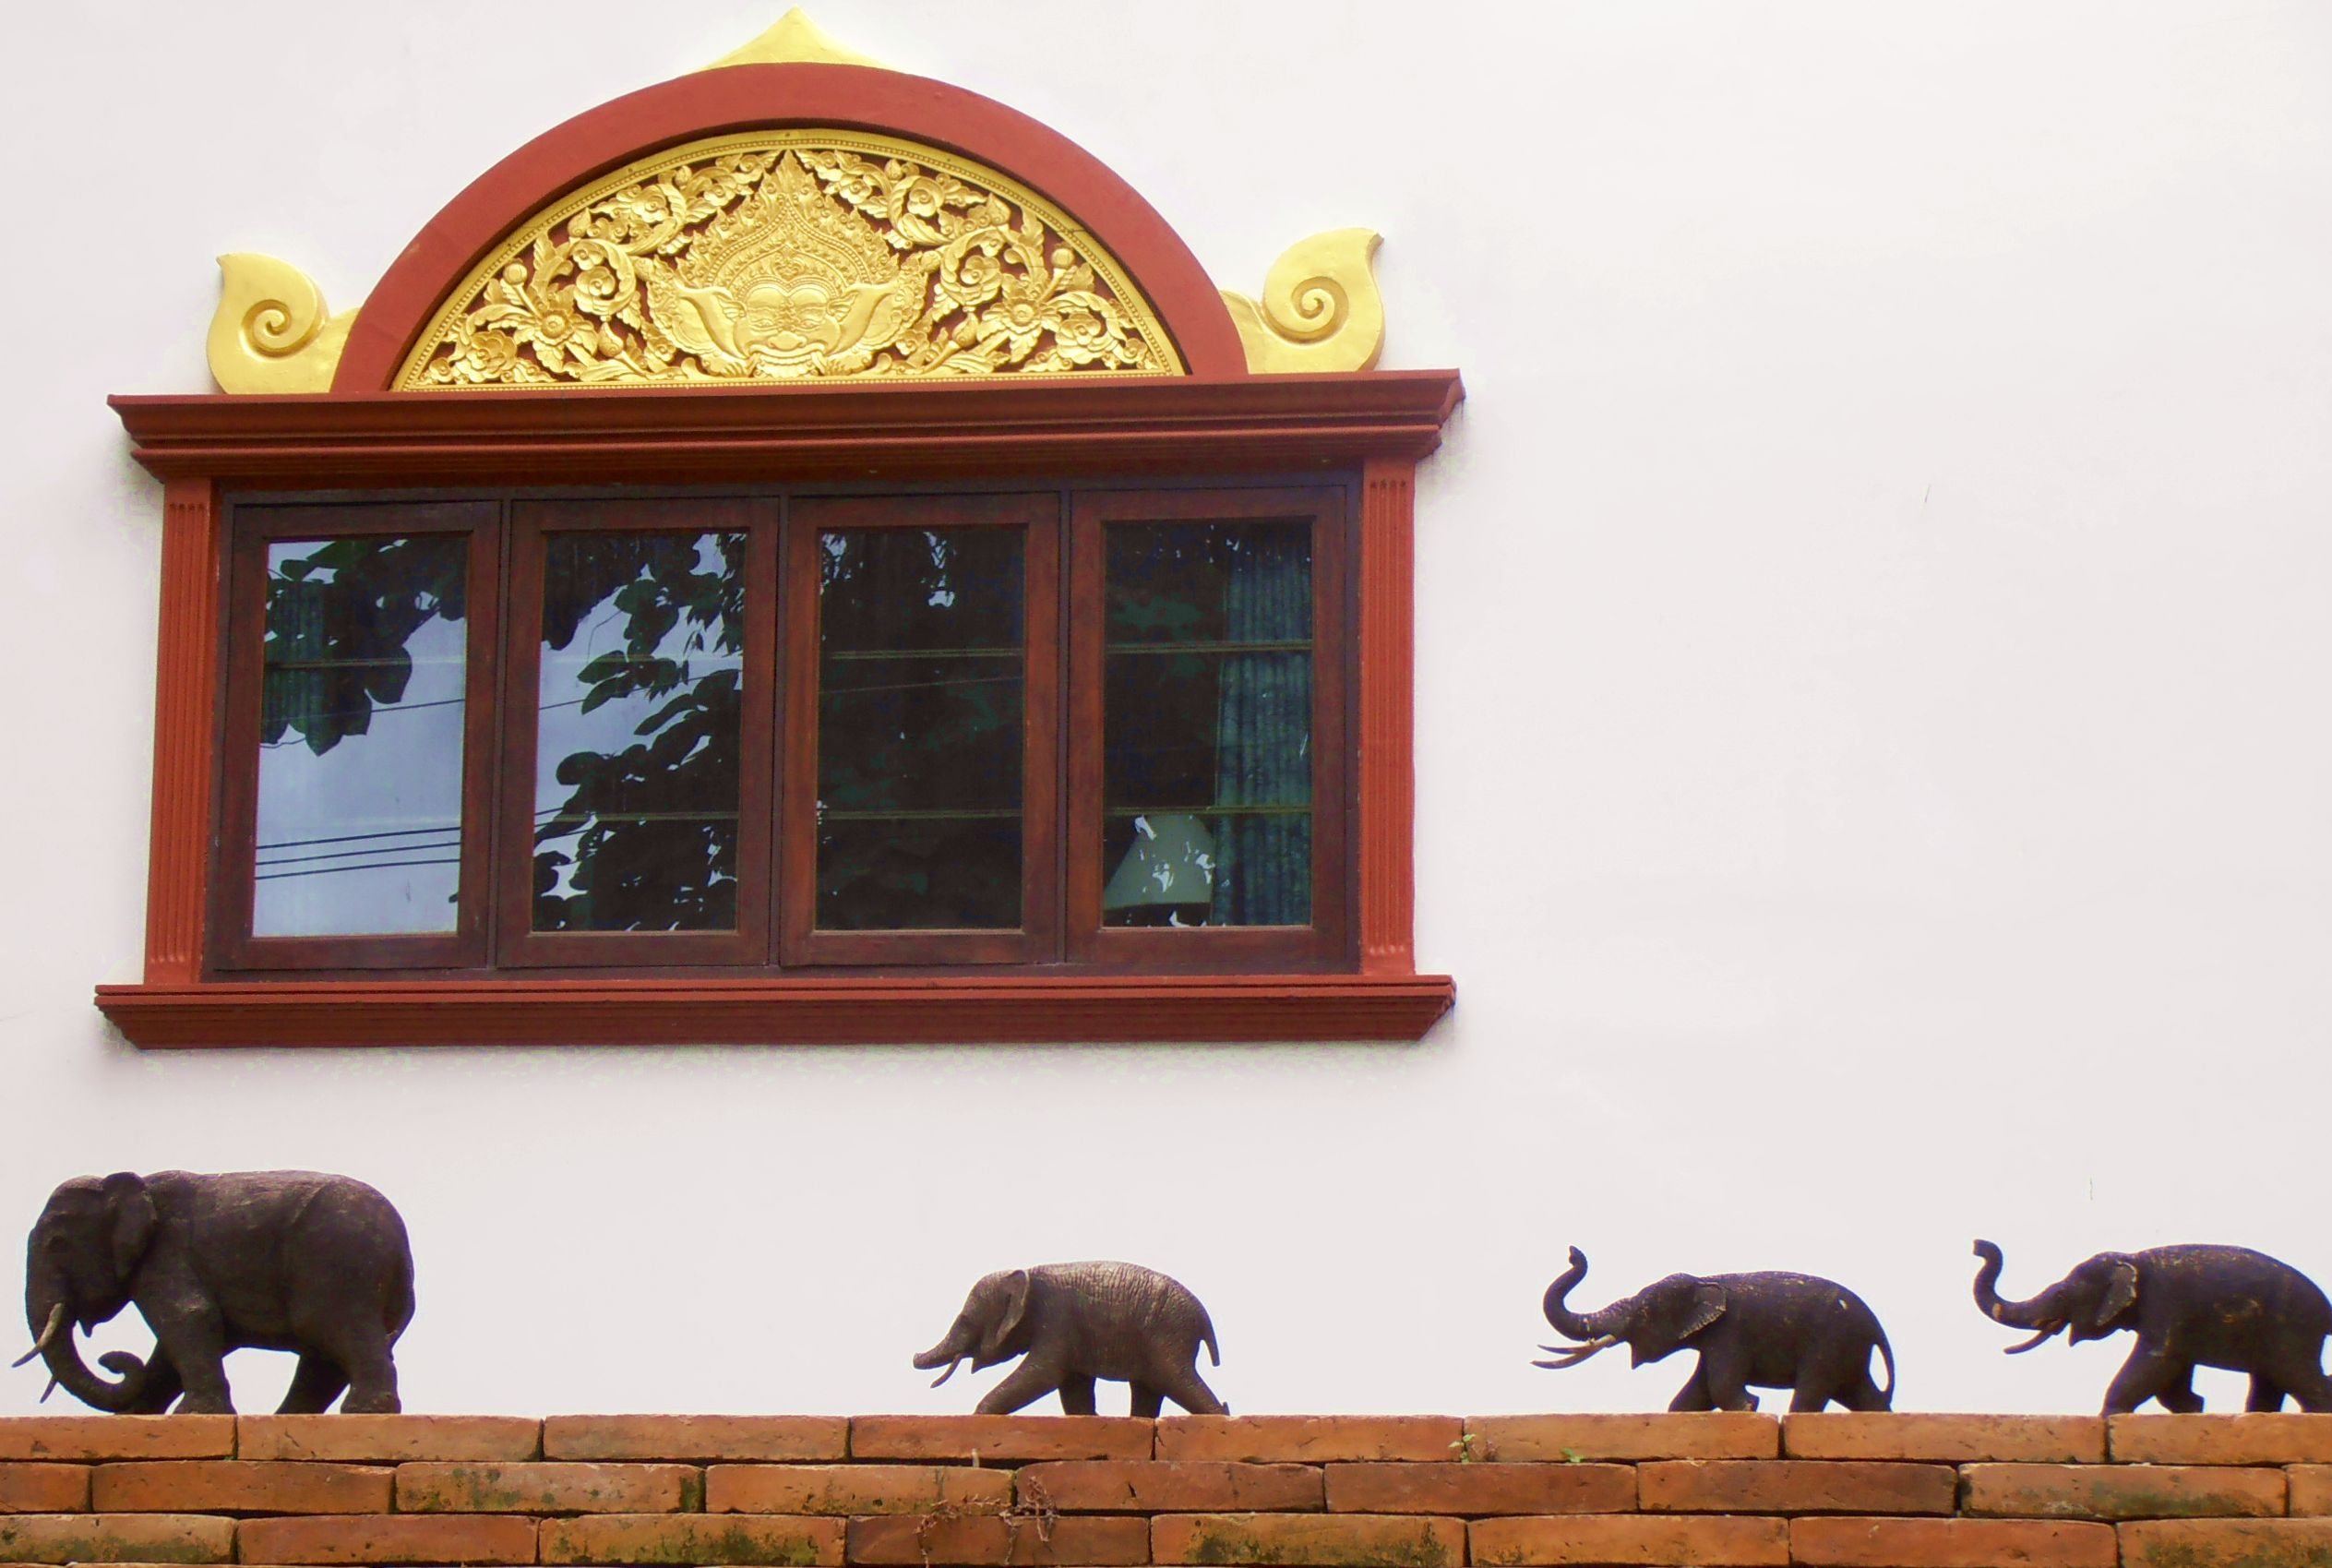 Chiang Mai Thailand sculptures